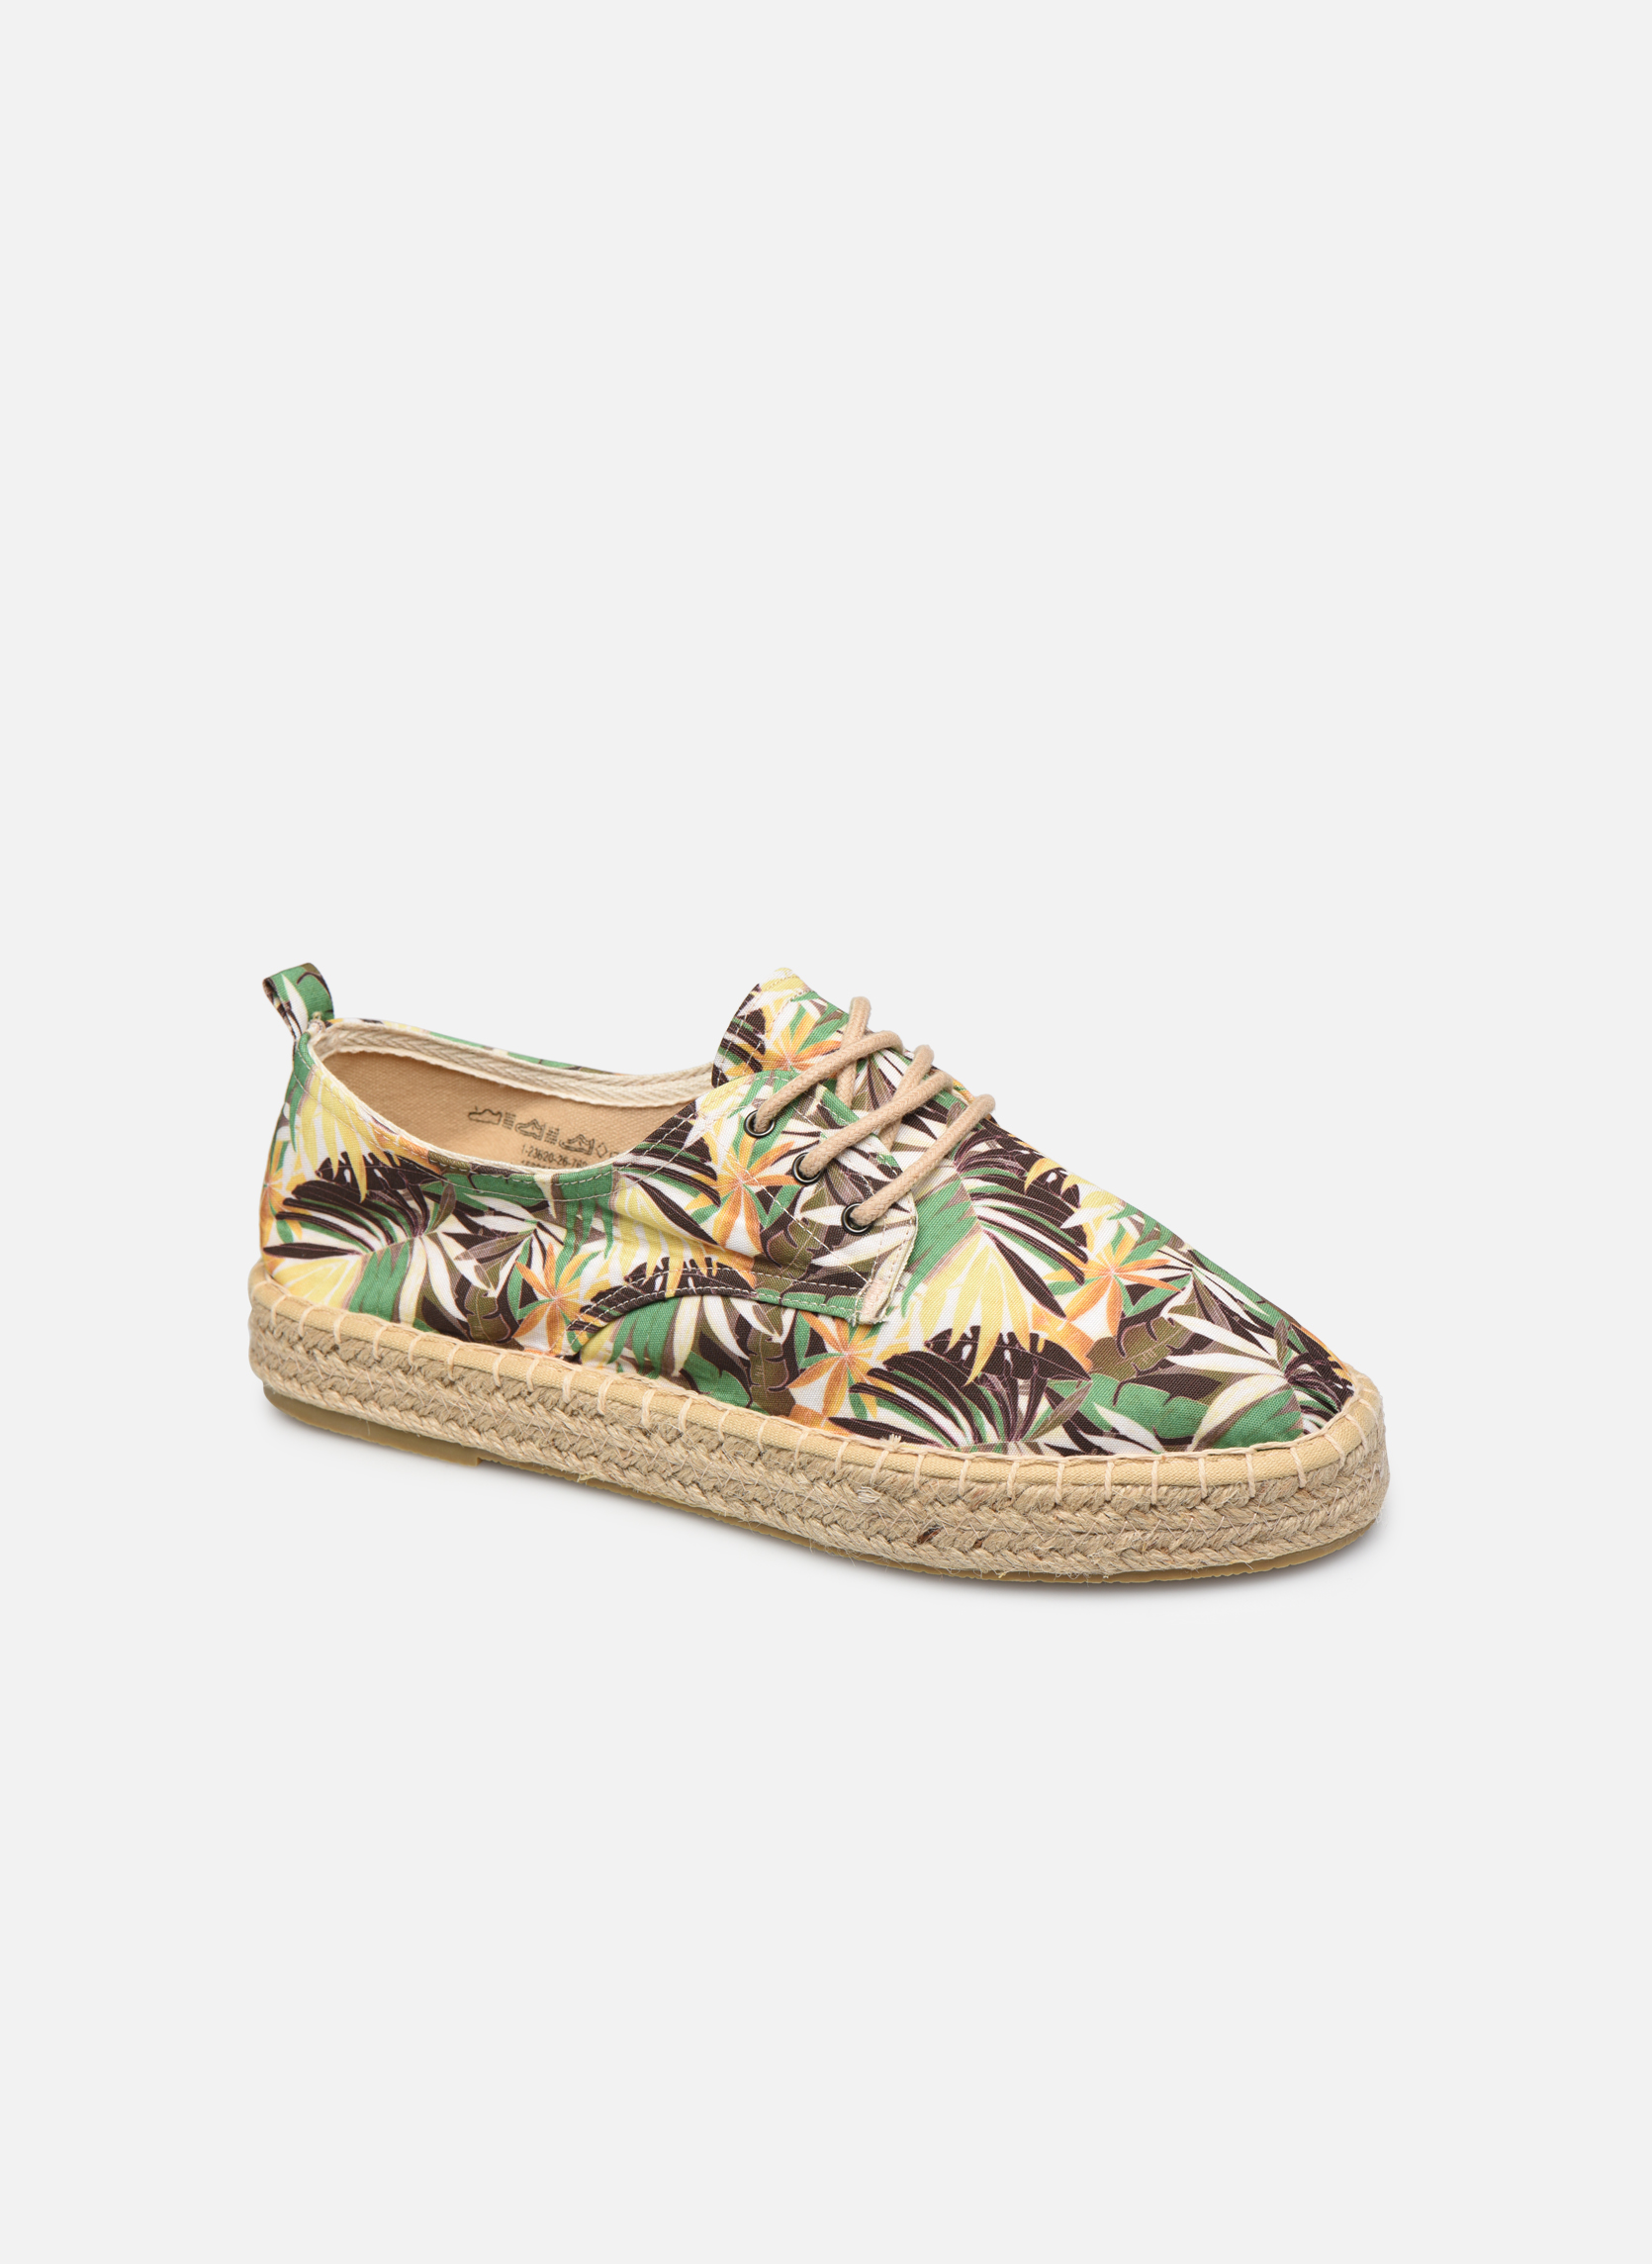 Chaussures à lacets Femme Glorira